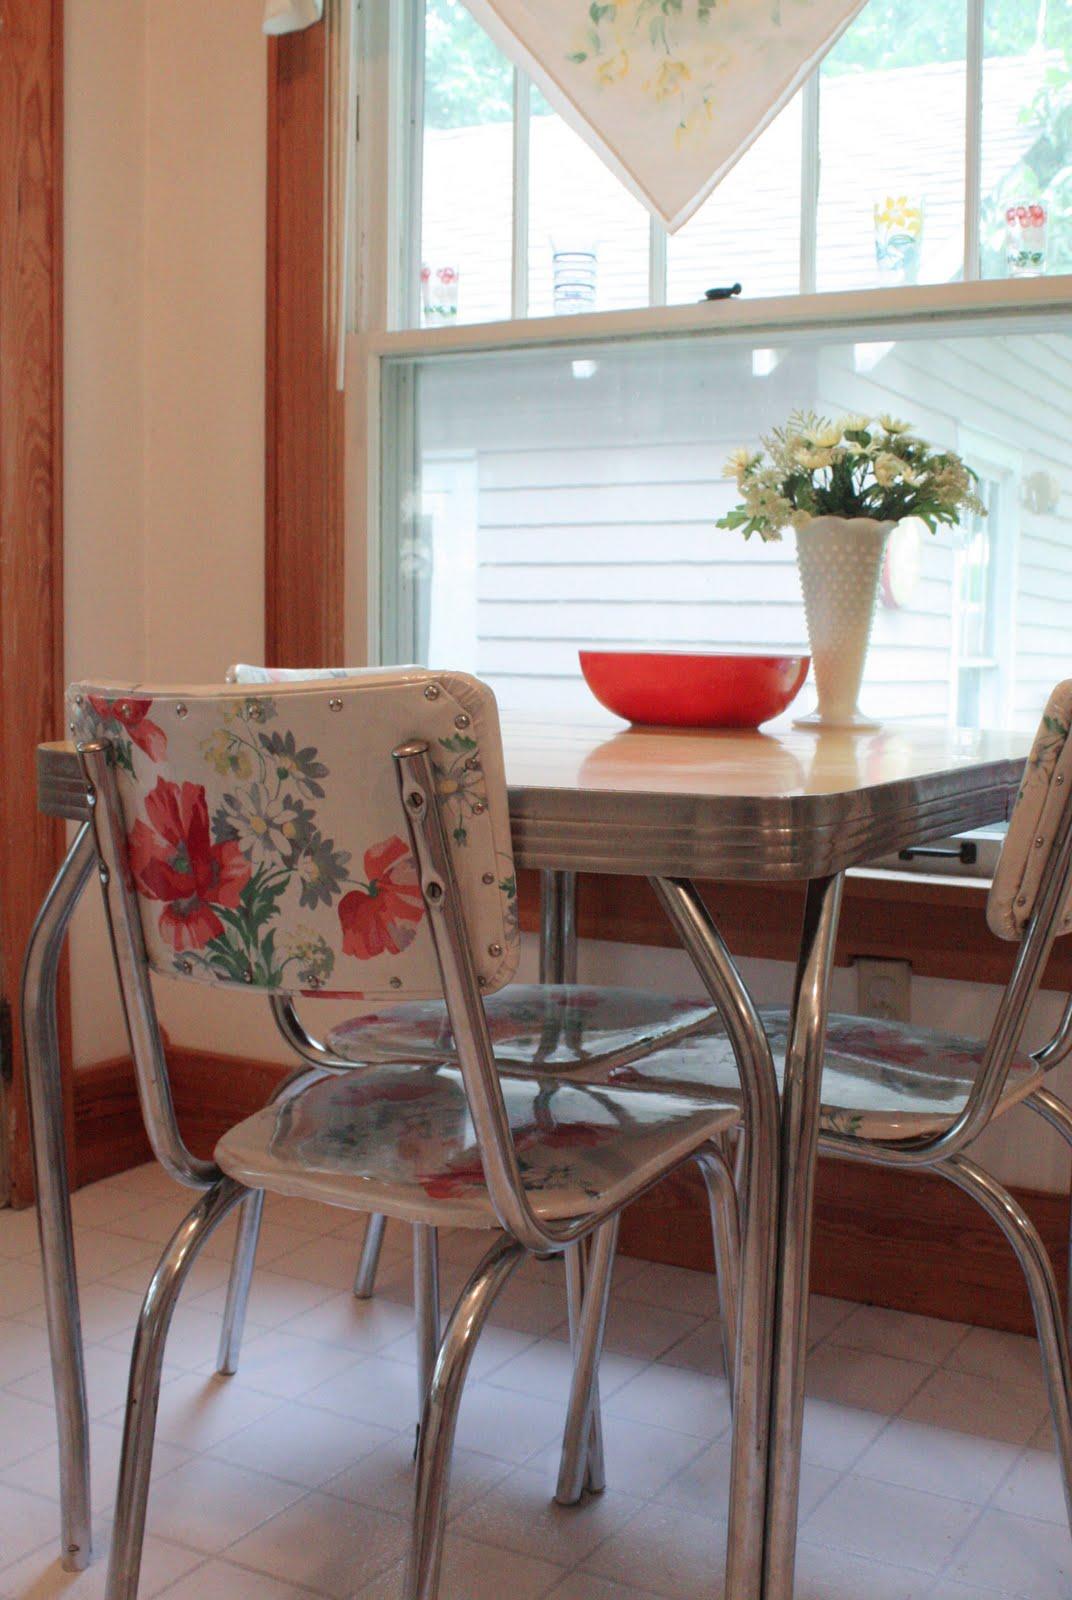 Amy J. Delightful Blog: Using Vintage Tablecloths Part 2